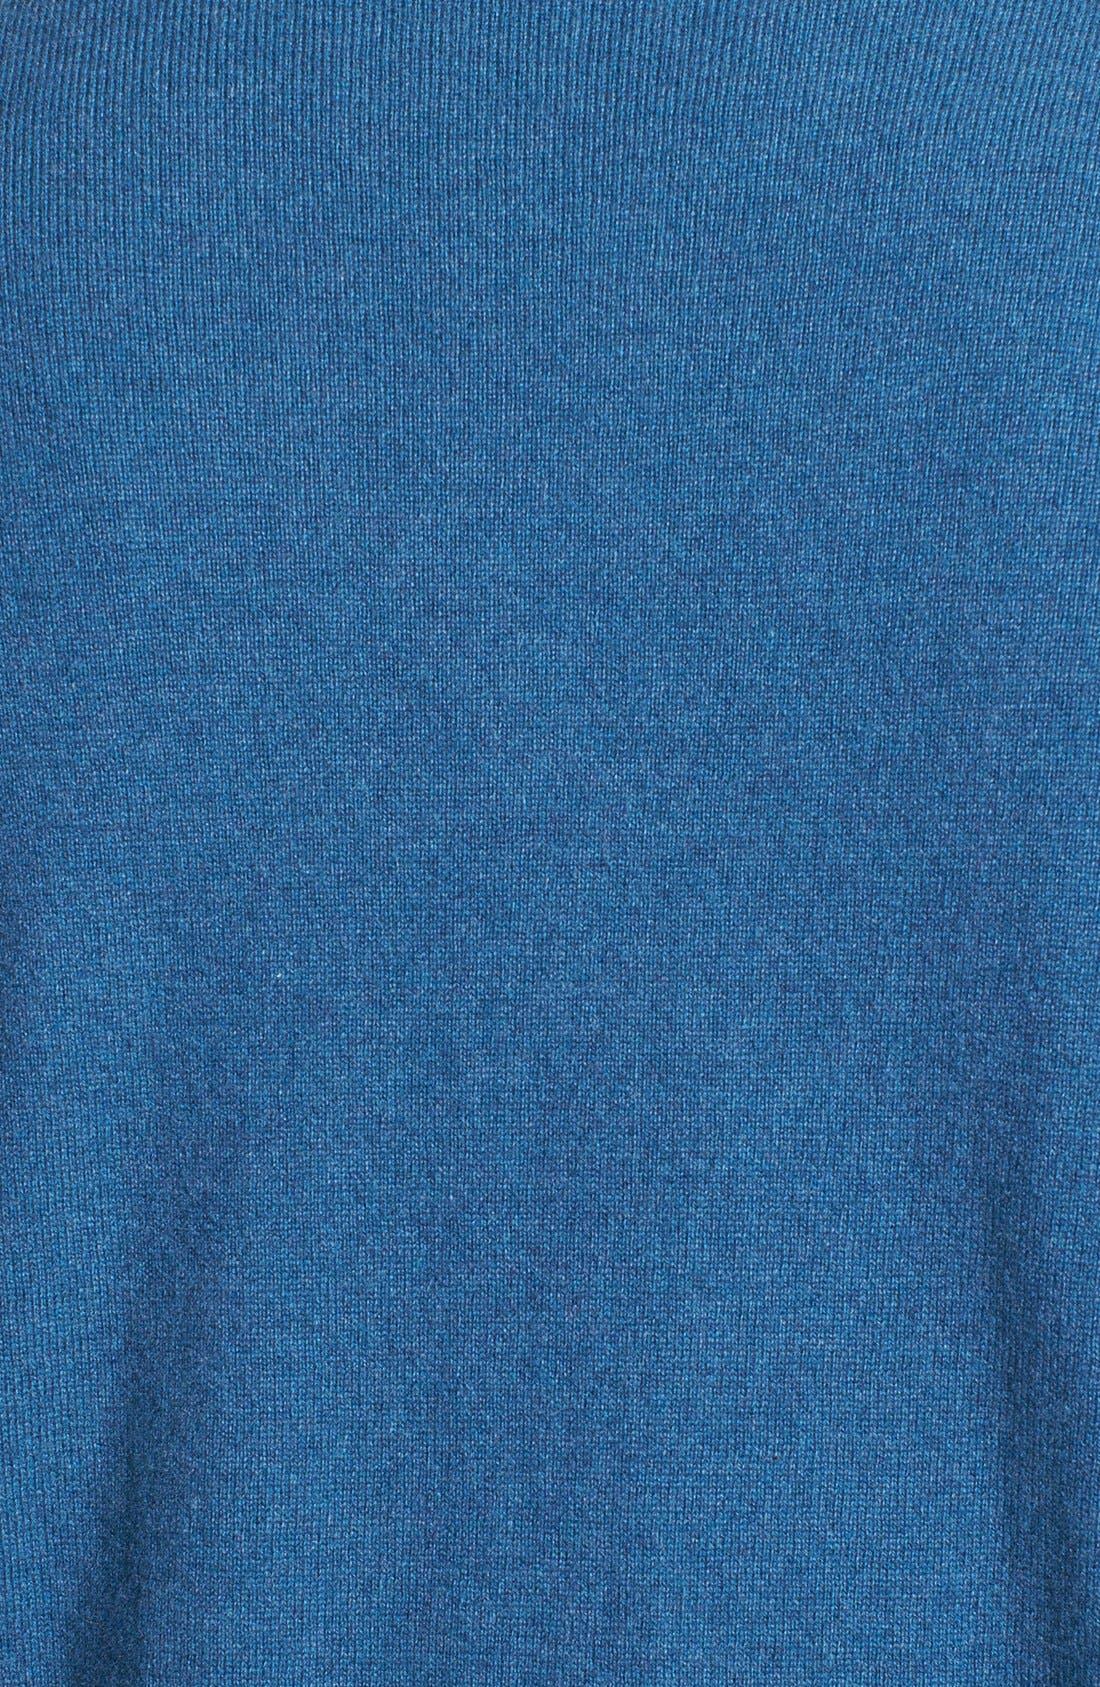 Alternate Image 3  - Robert Talbott Quarter Zip Cashmere Vest